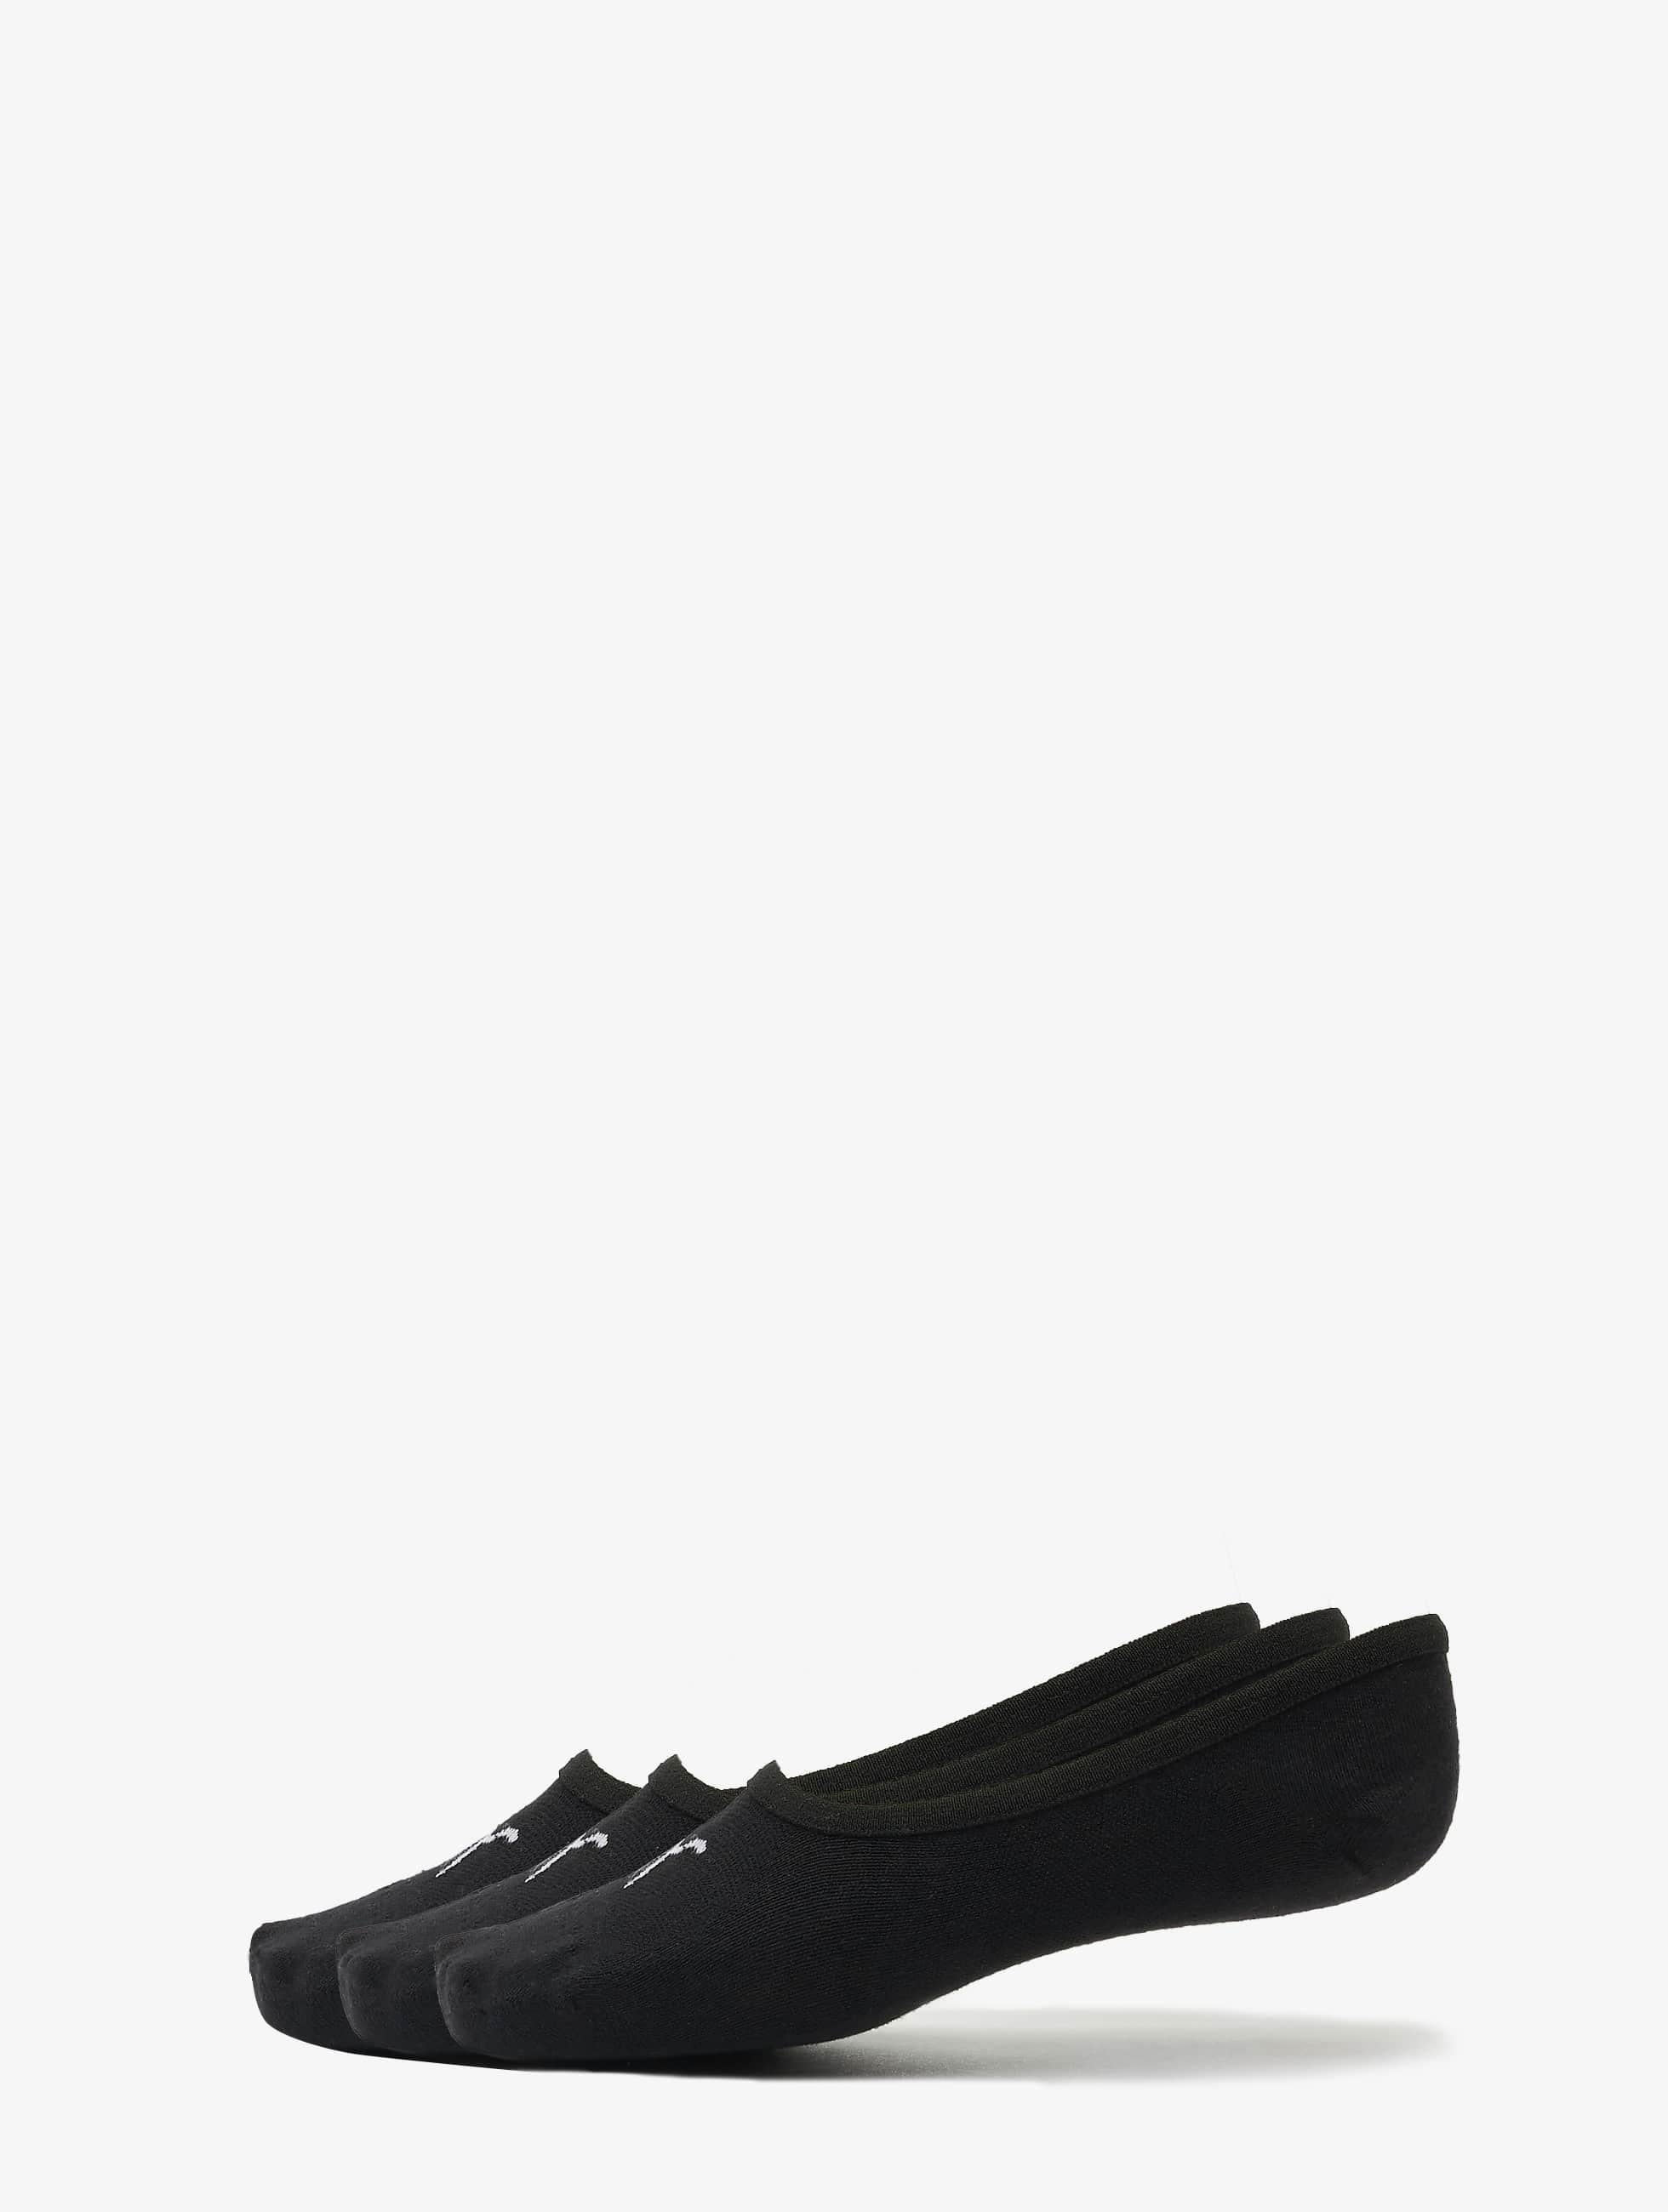 Puma Männer,Frauen Socken 3-Pack Footies in schwarz